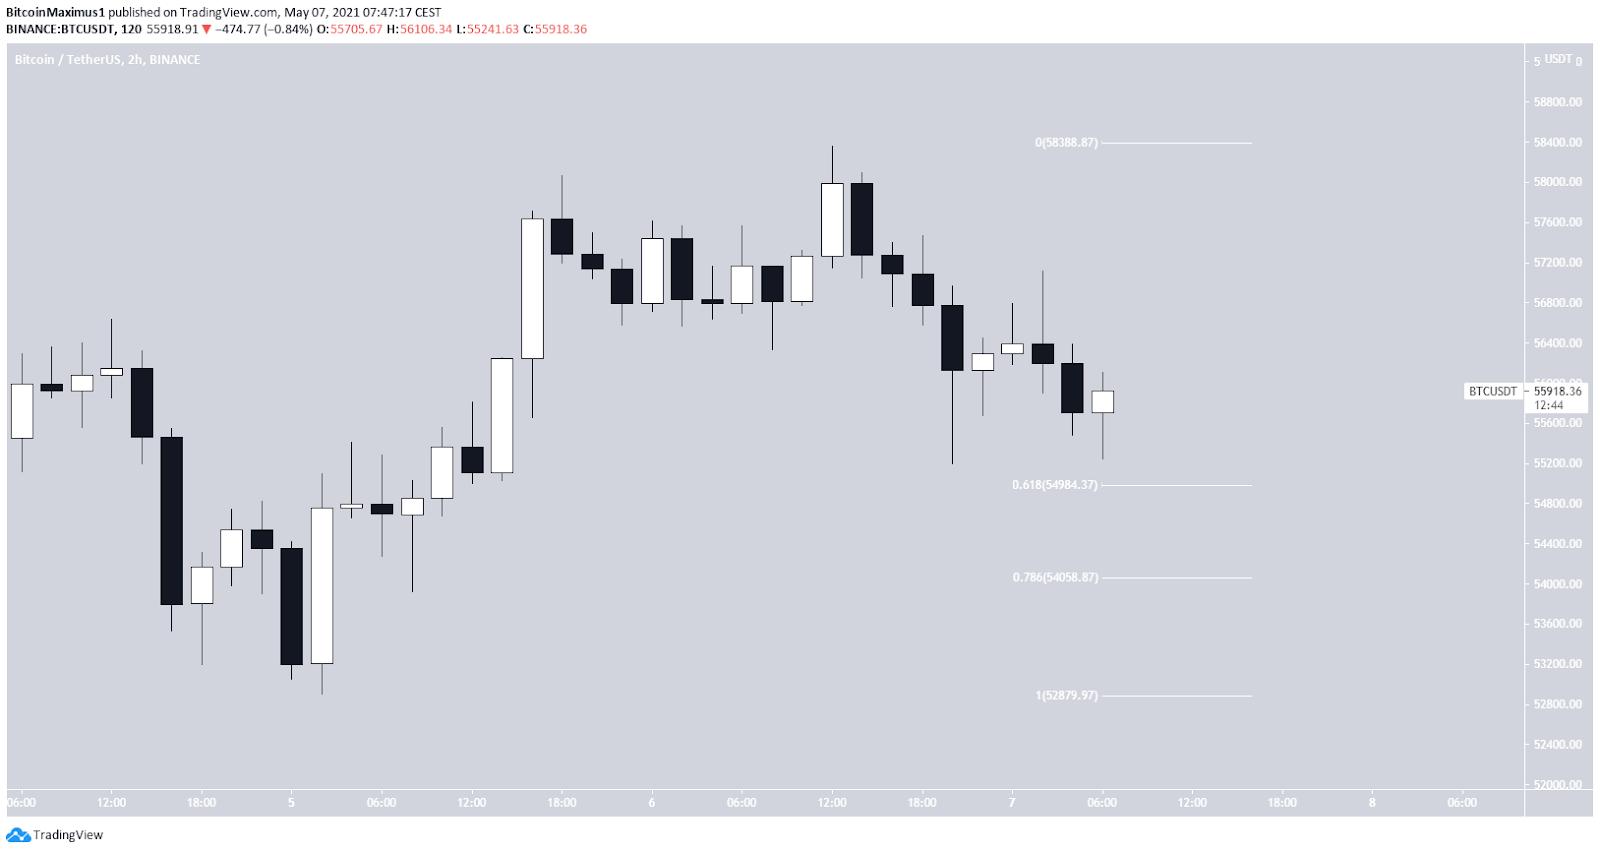 Bitcoin Kurs Preis Chart 2-Stunden 07.Mai 2021